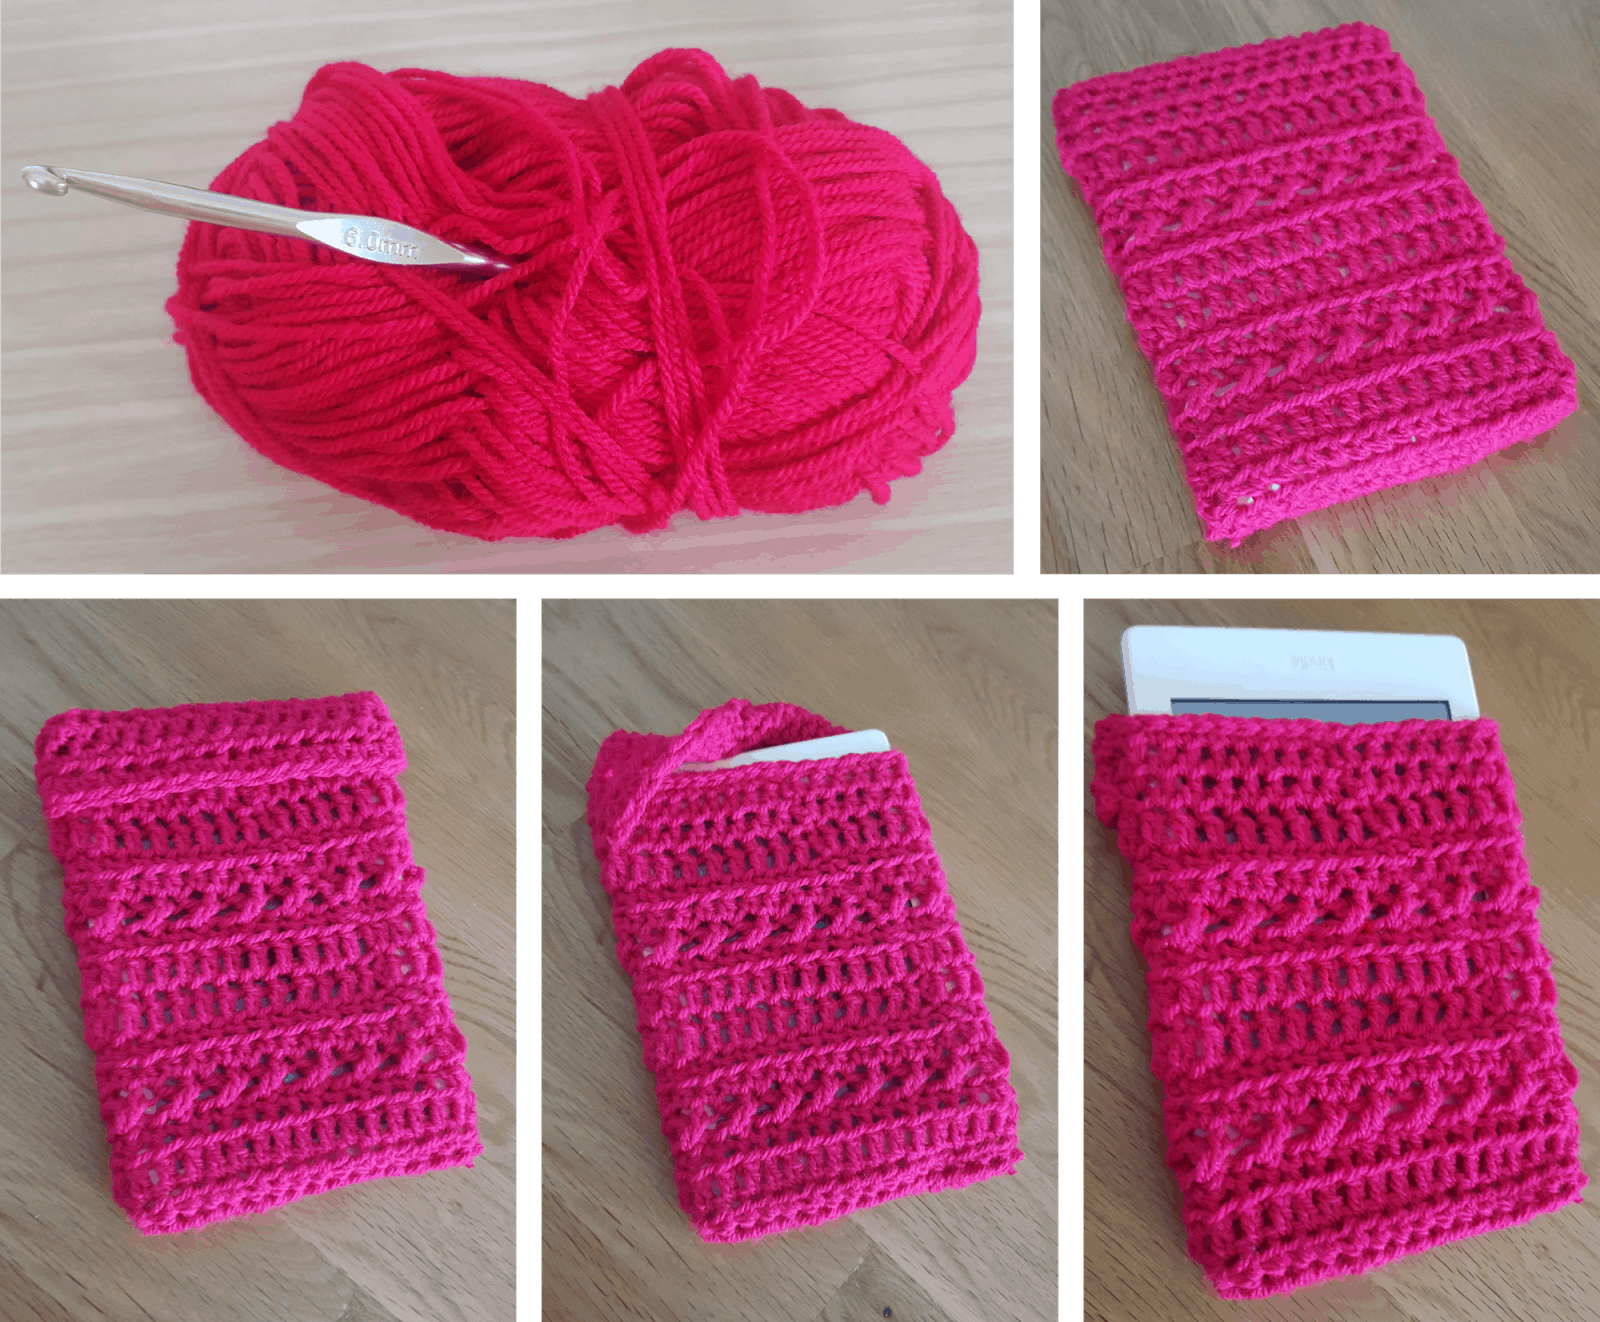 Crochet kindle case